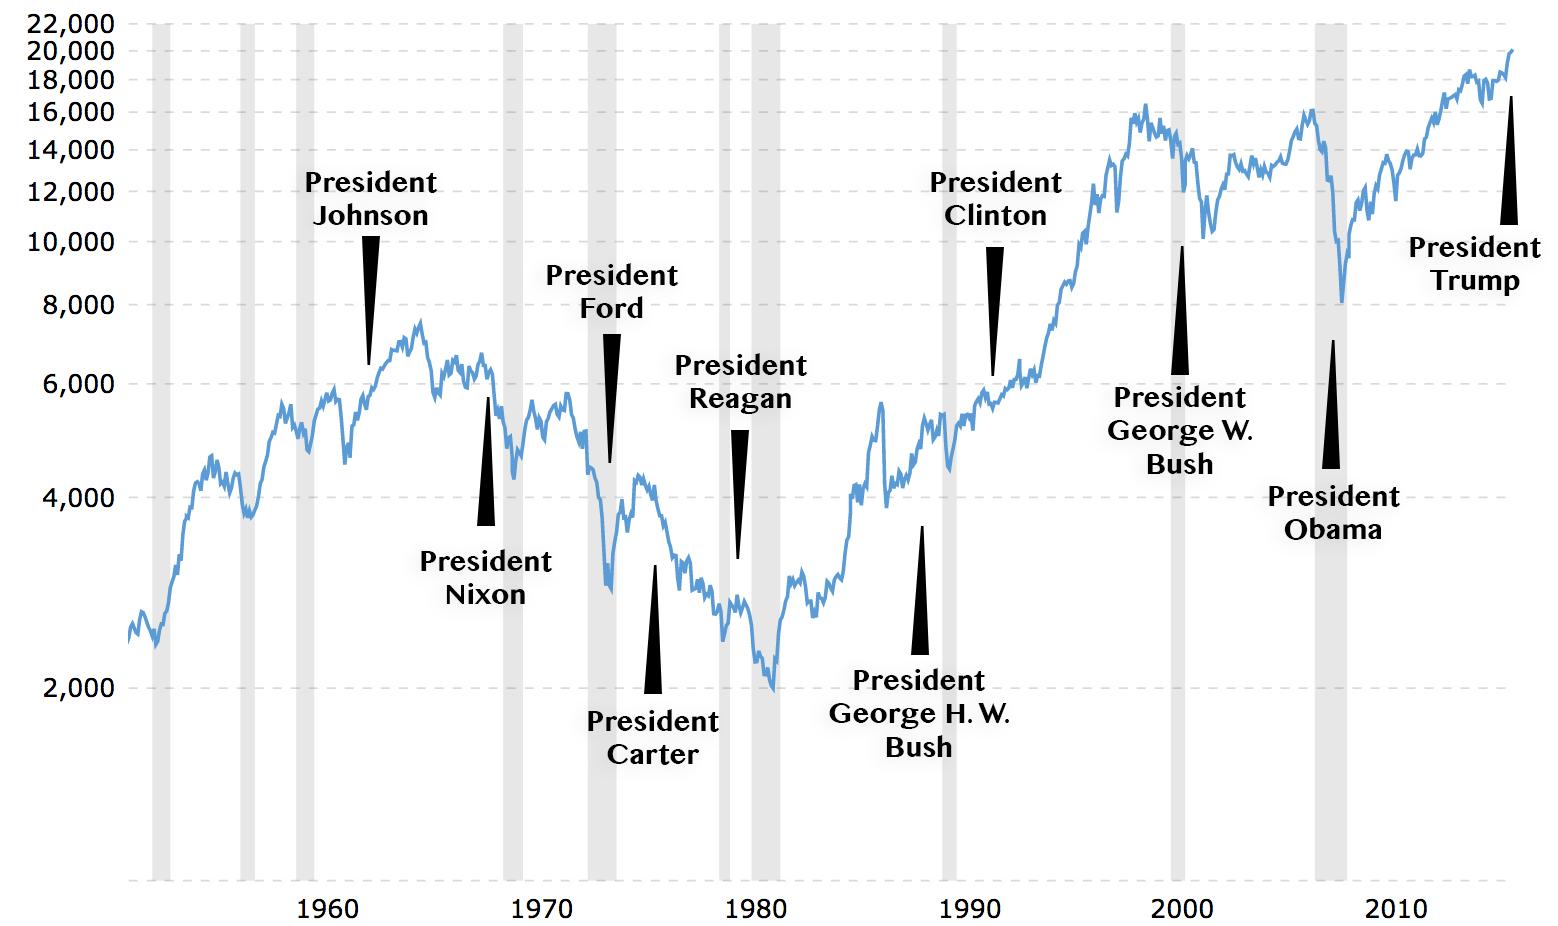 Historical Dow Jones performance chart